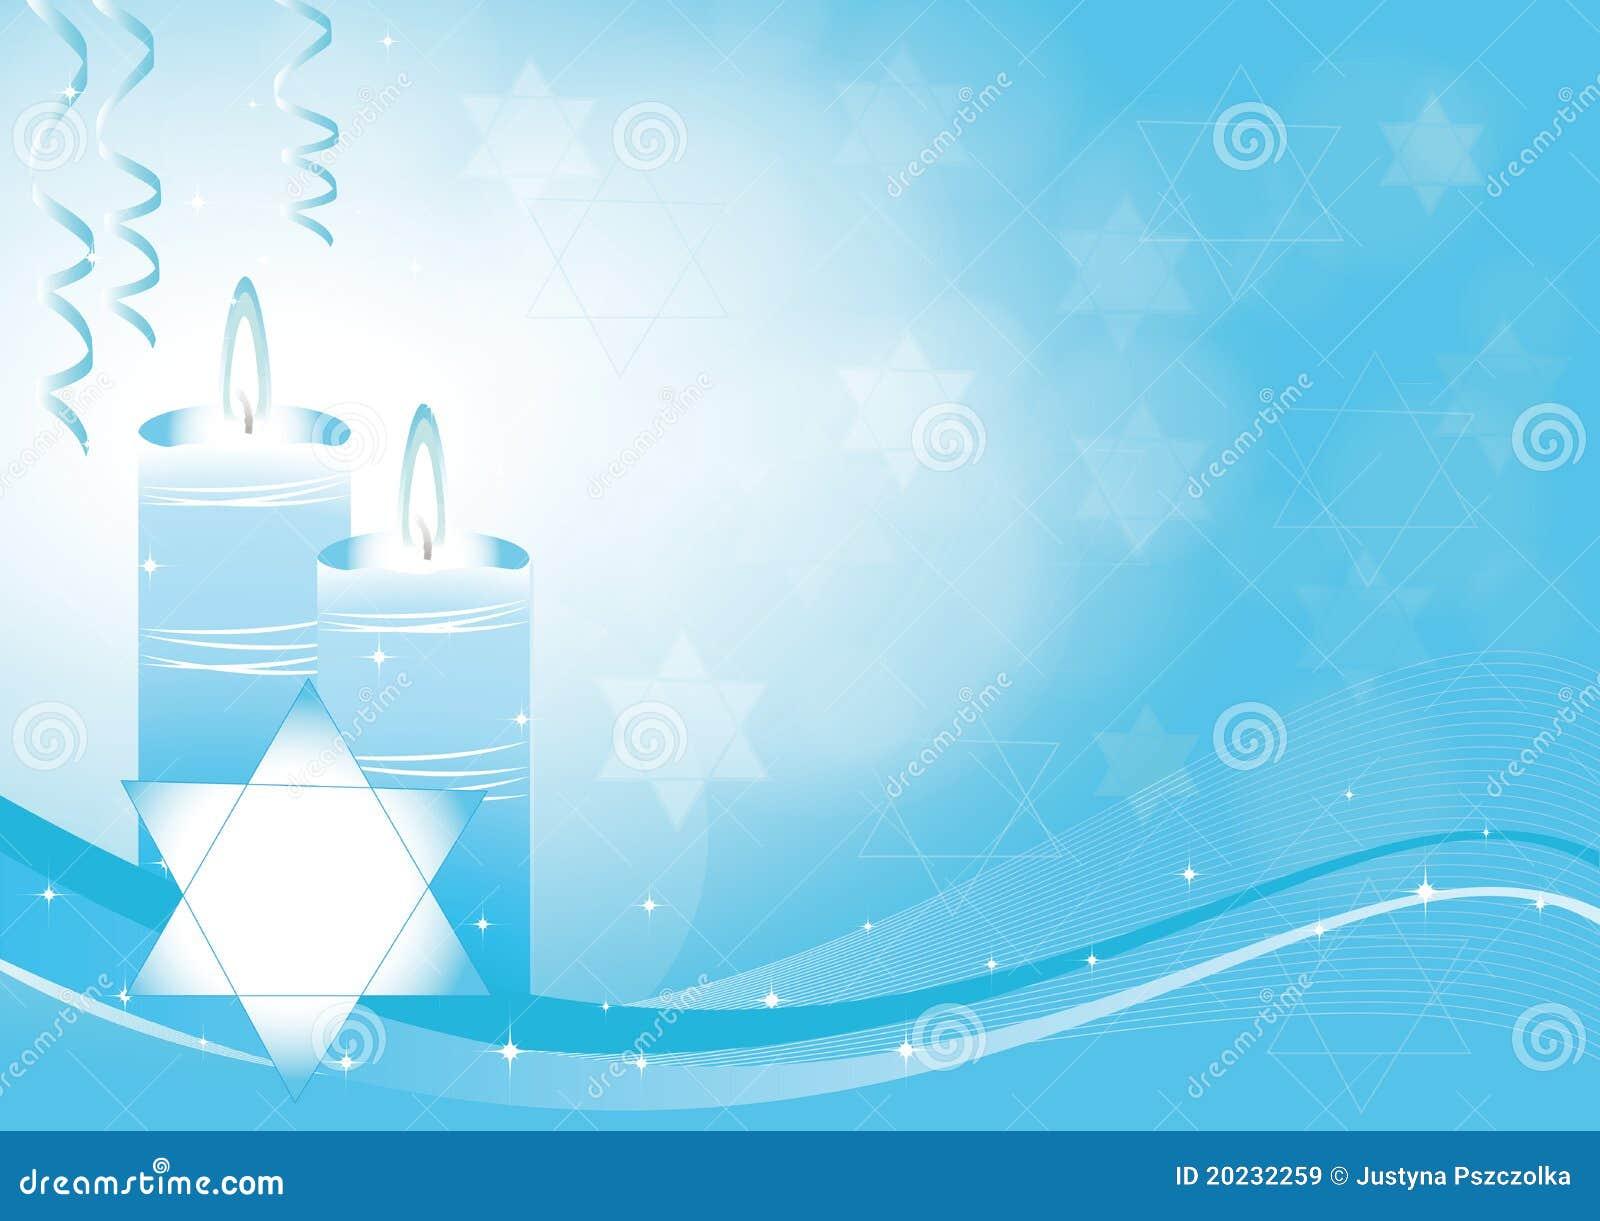 hanukkah background royalty free stock images